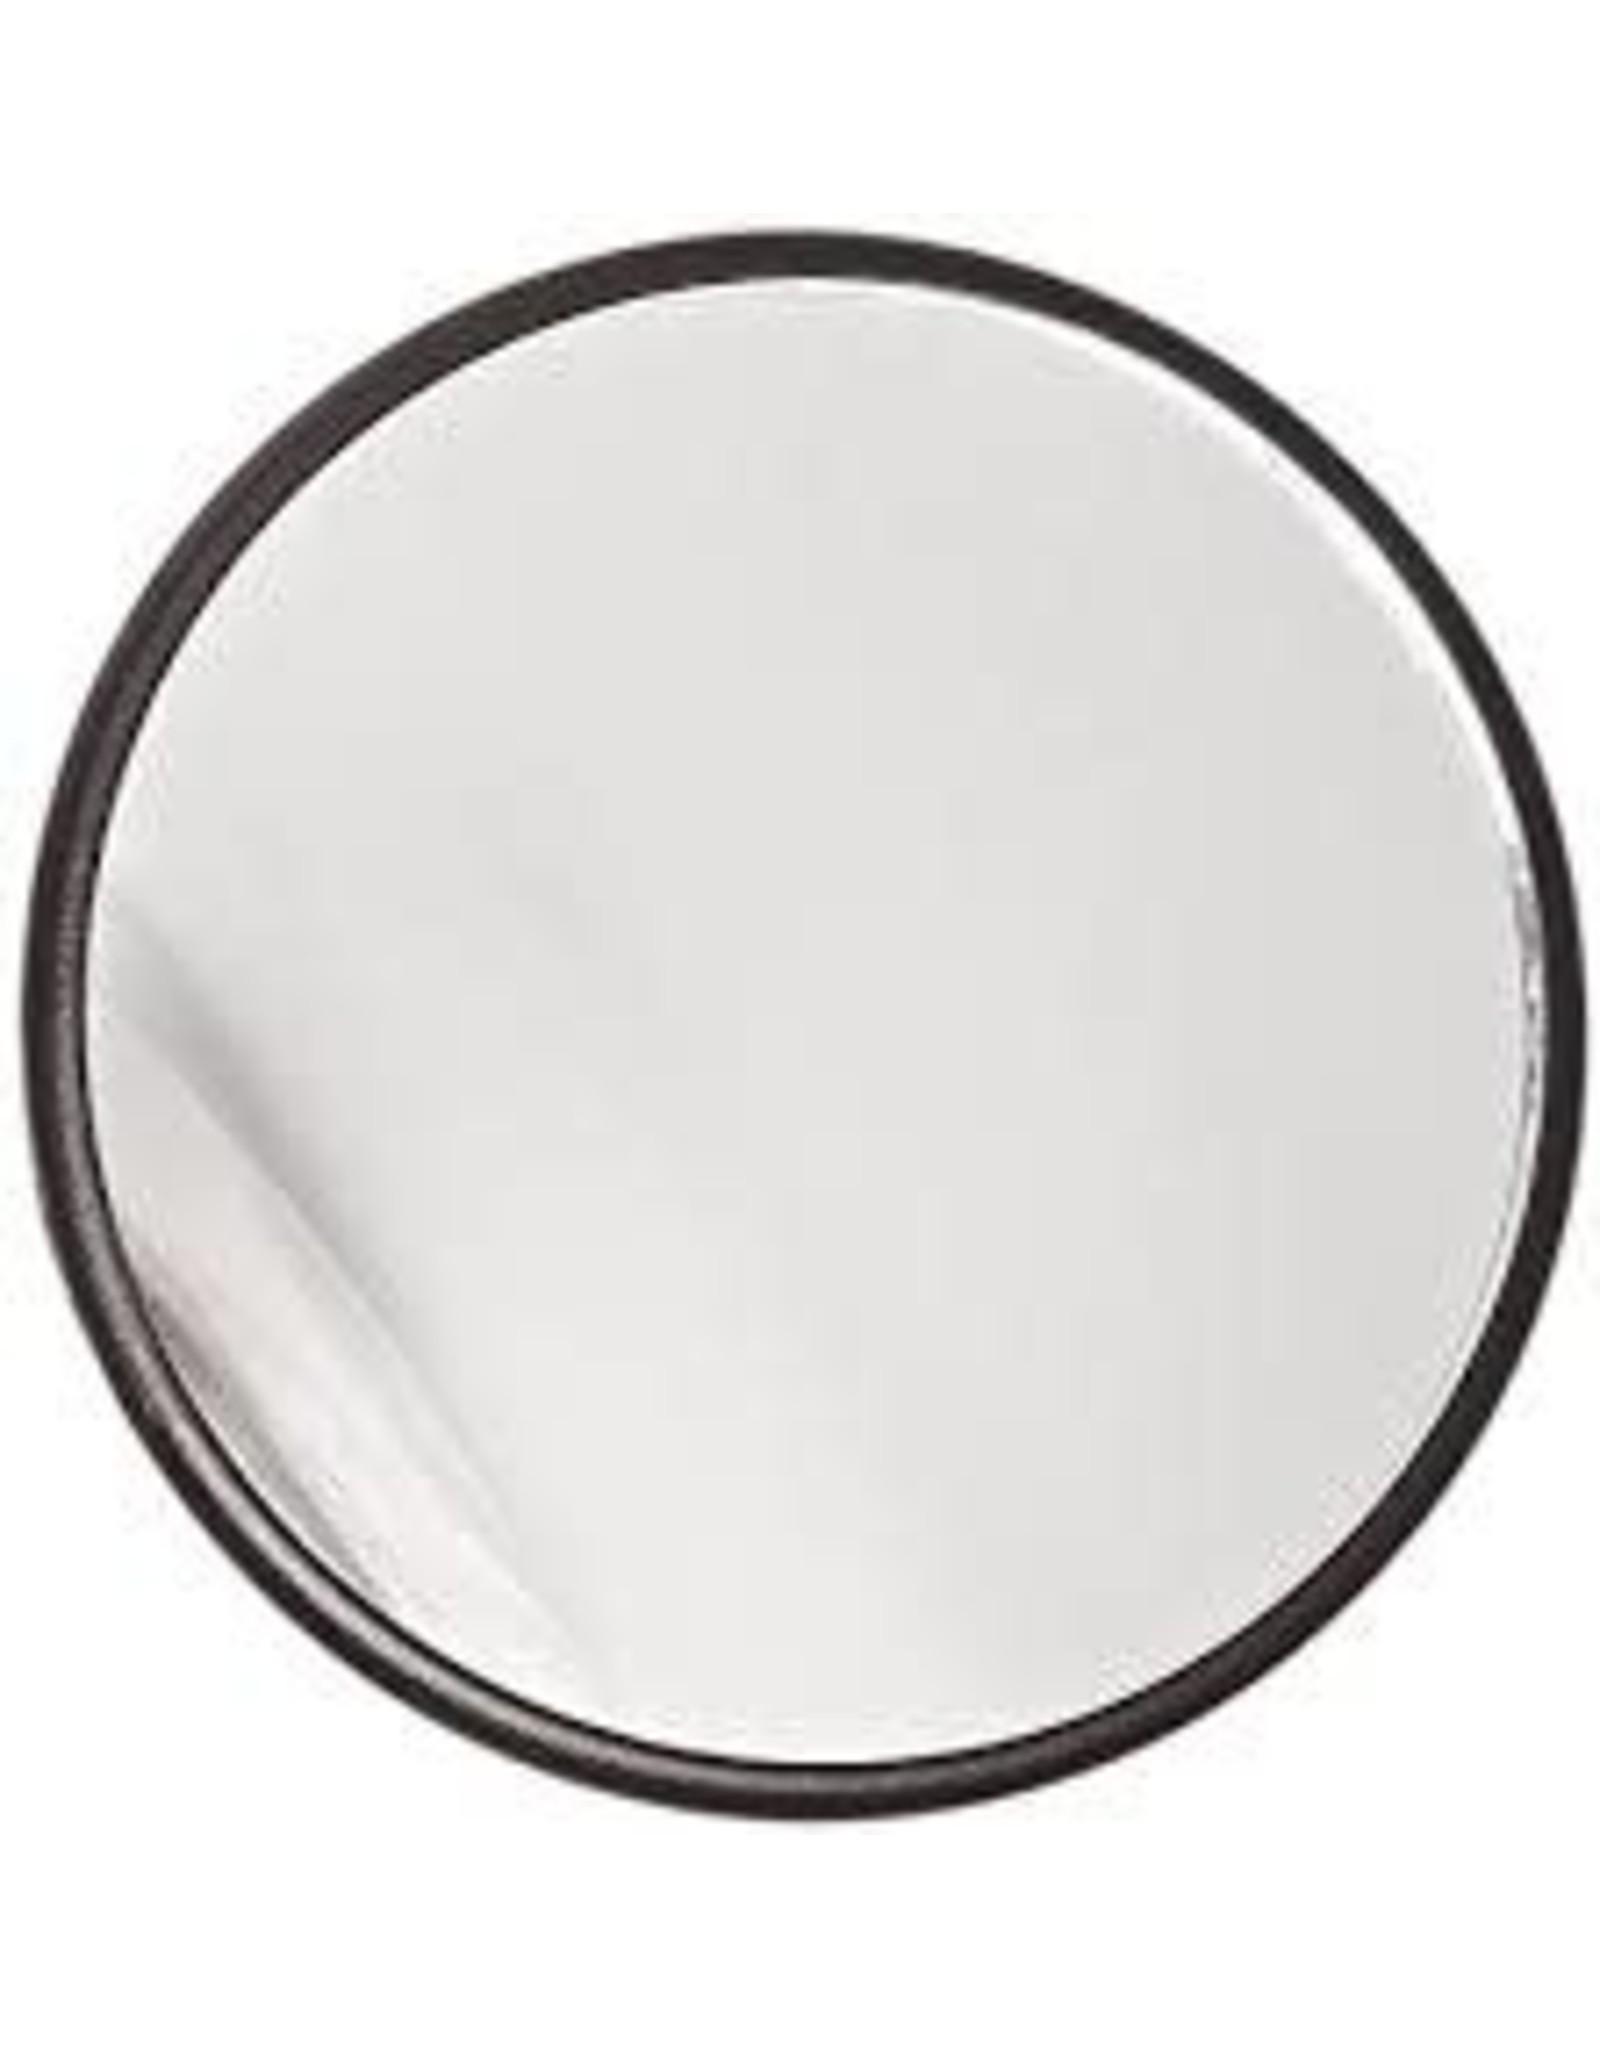 Mirrycle Mirror Mirrycle Mountain Replacement Lens